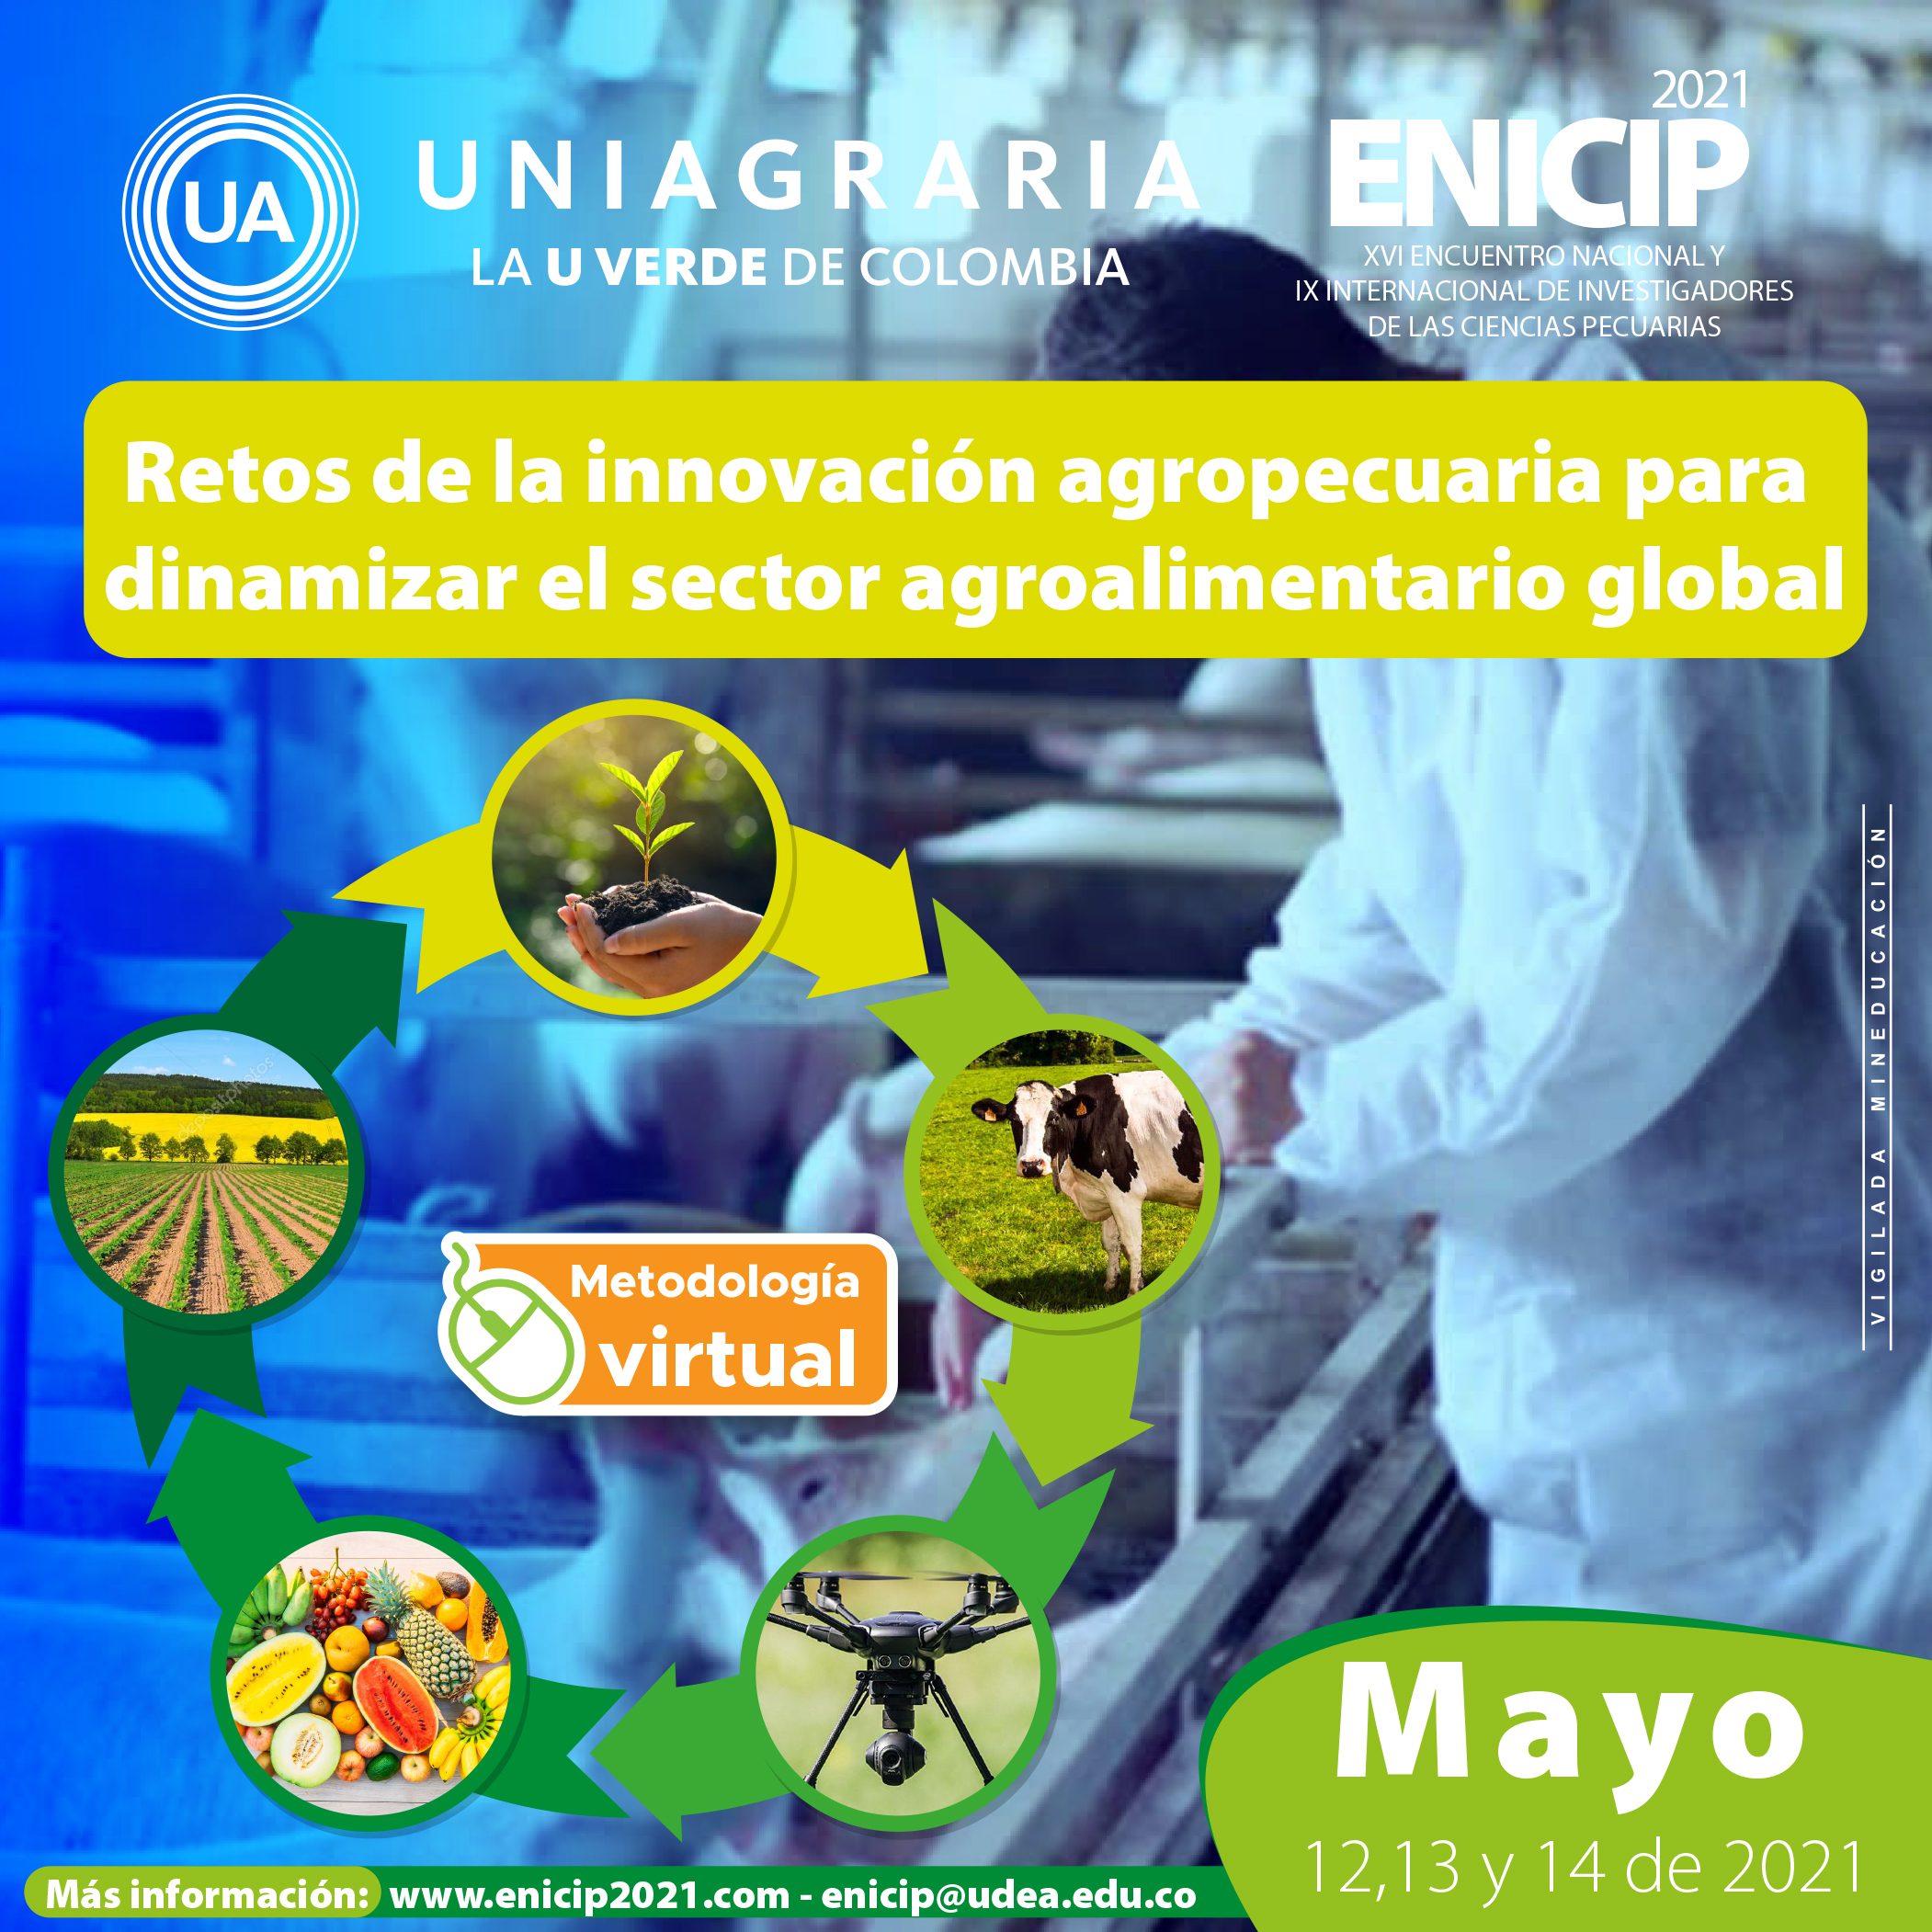 Retos de la innovación agropecuaria para dinamizar el sector agroalimentario global